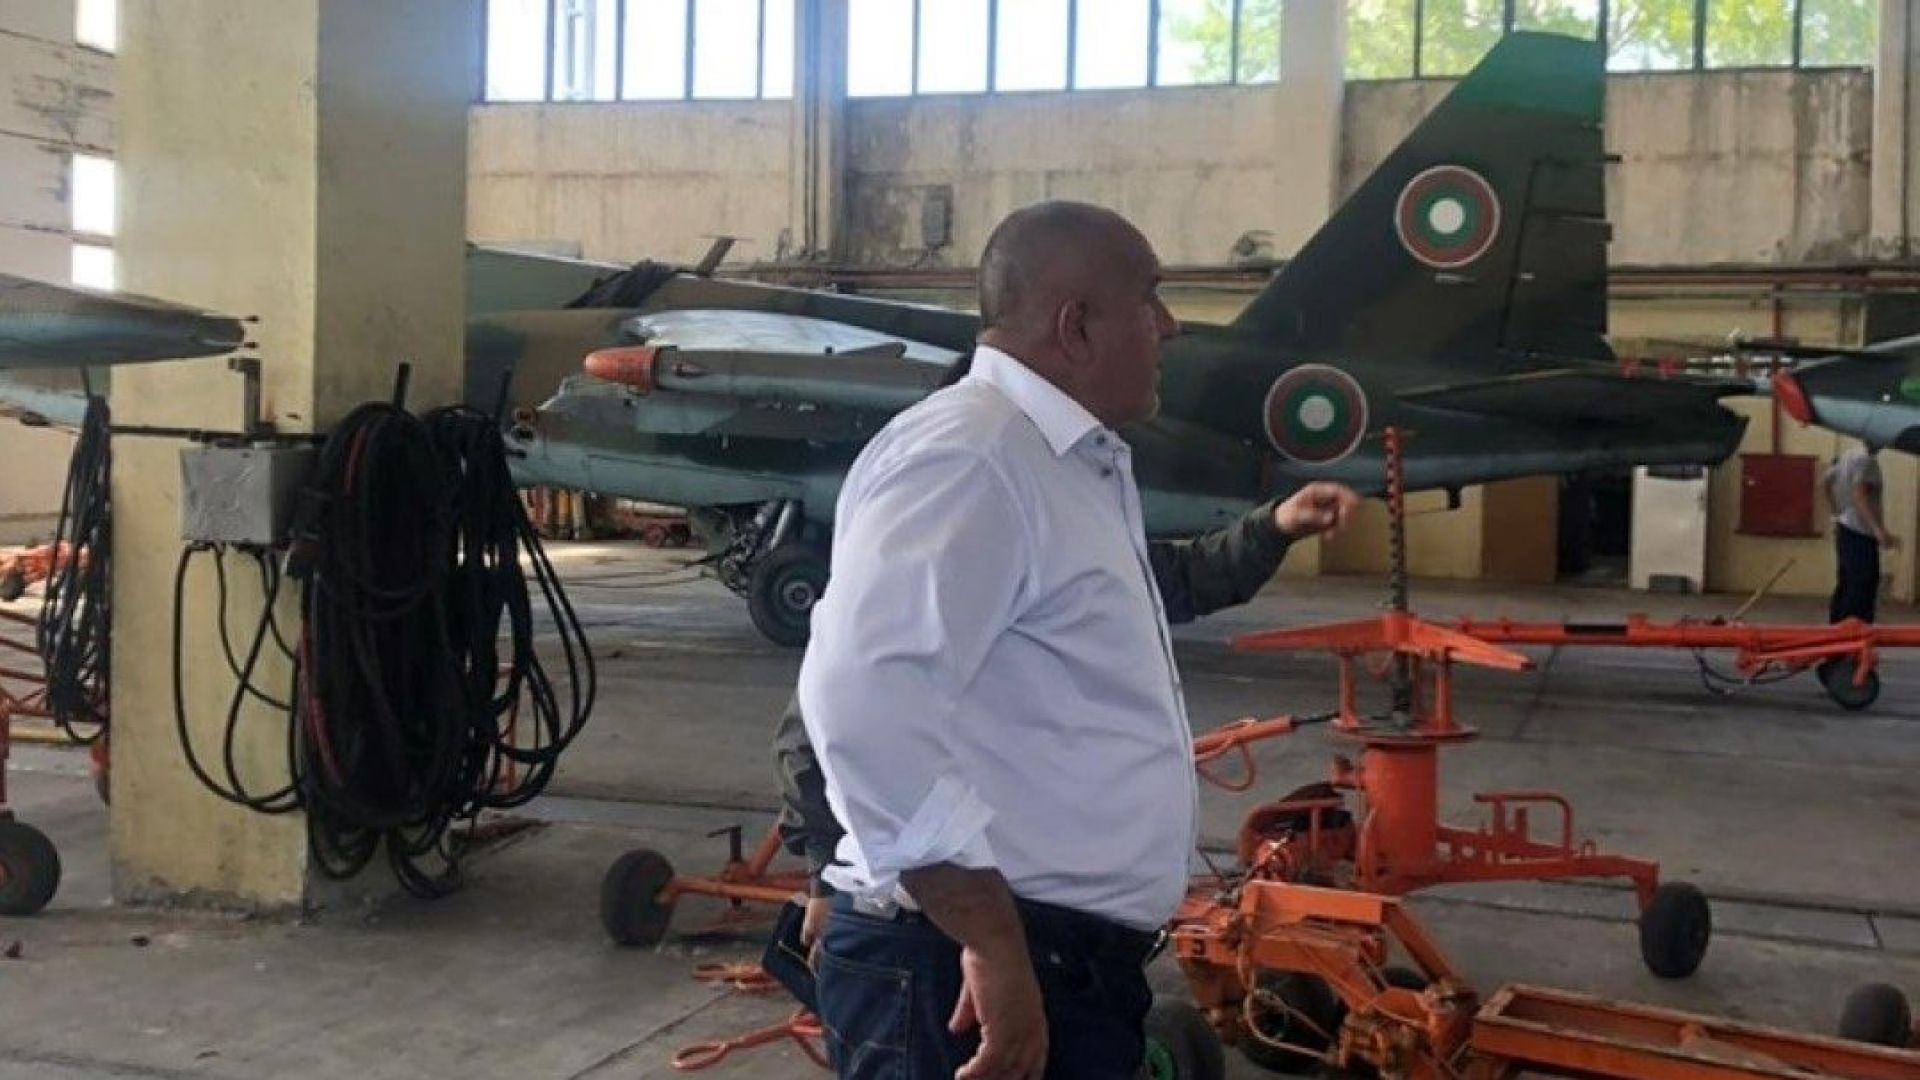 Бойко Борисов: Правителството преведе 82,510 млн. лв. за ремонта на самолетите Су-25